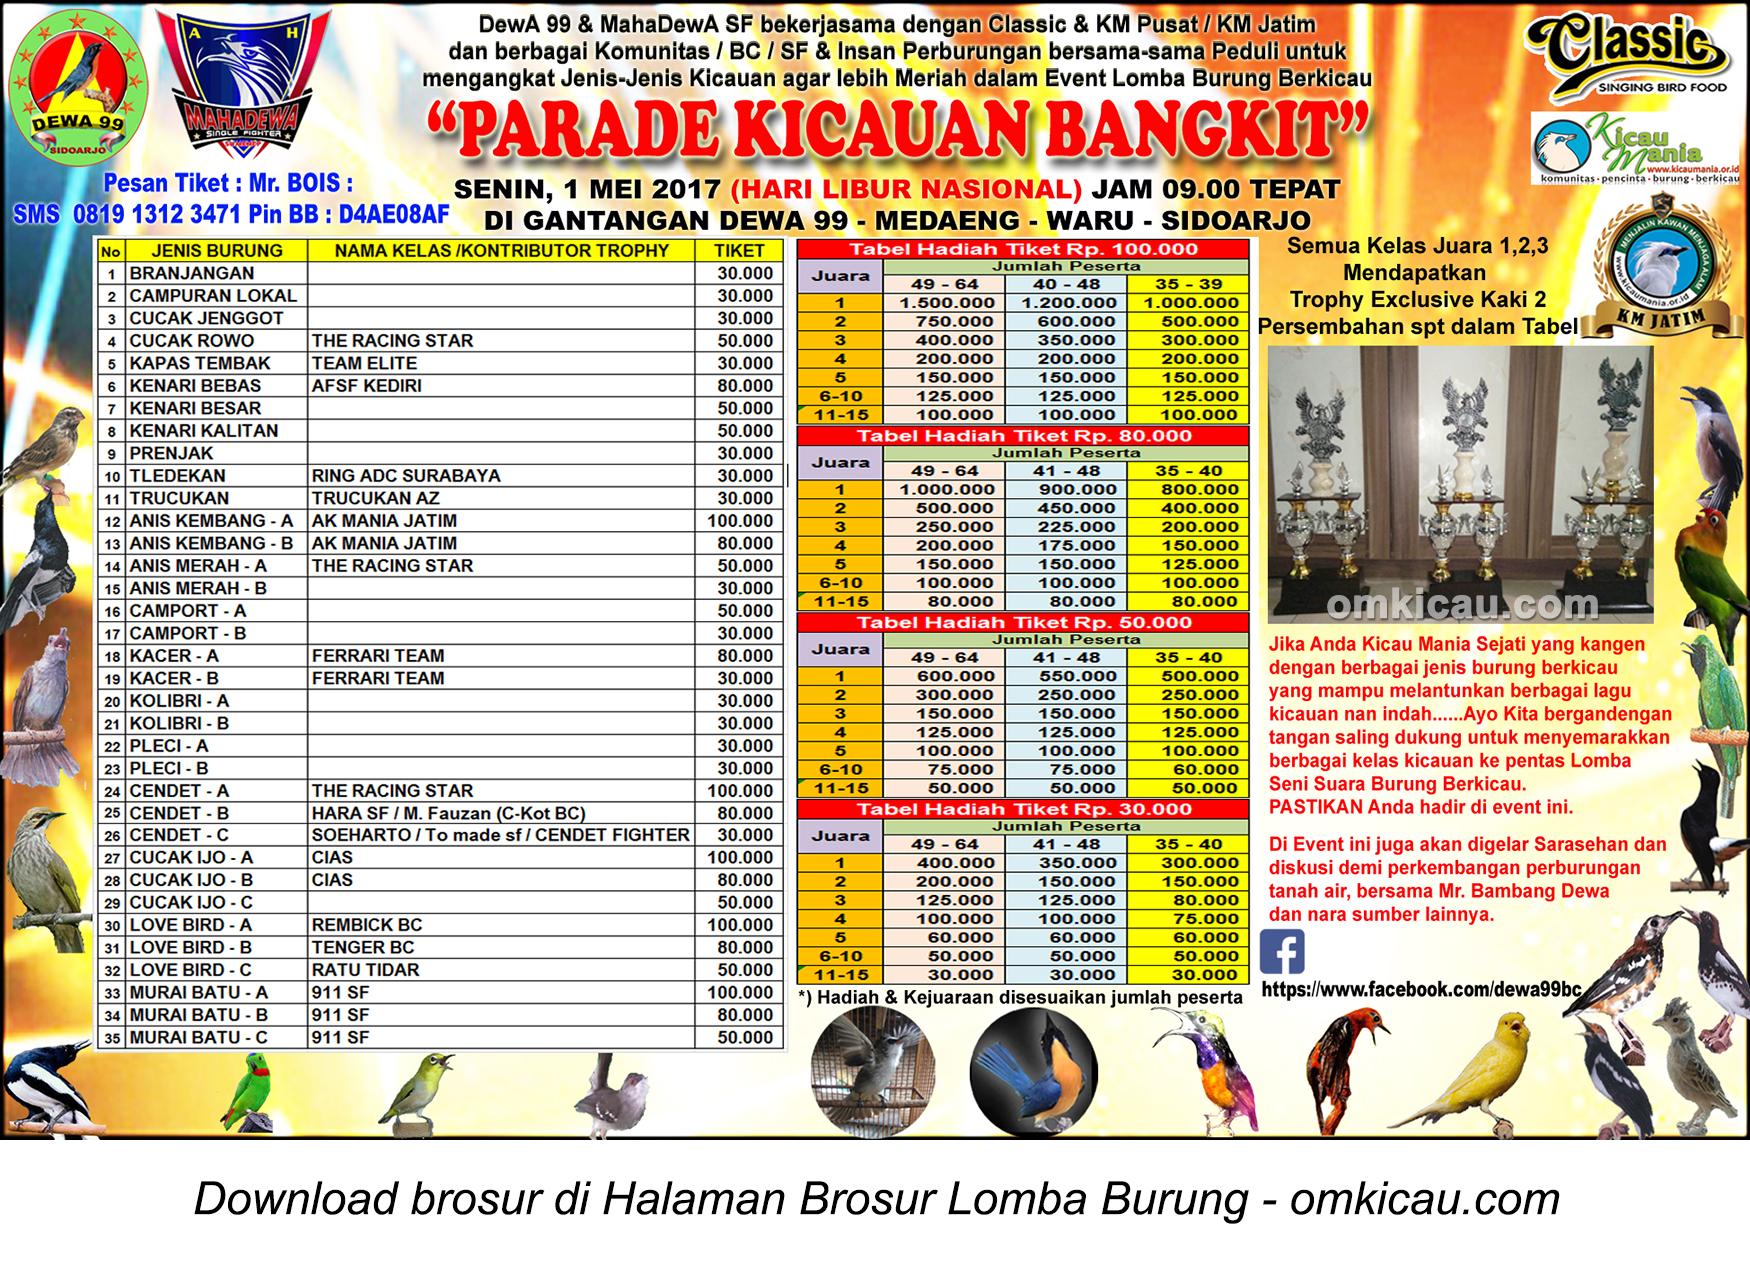 Brosur Lomba Burung Parade Kicauan Bangkit-Dewa 99, Sidoarjo, 1 Mei 2017